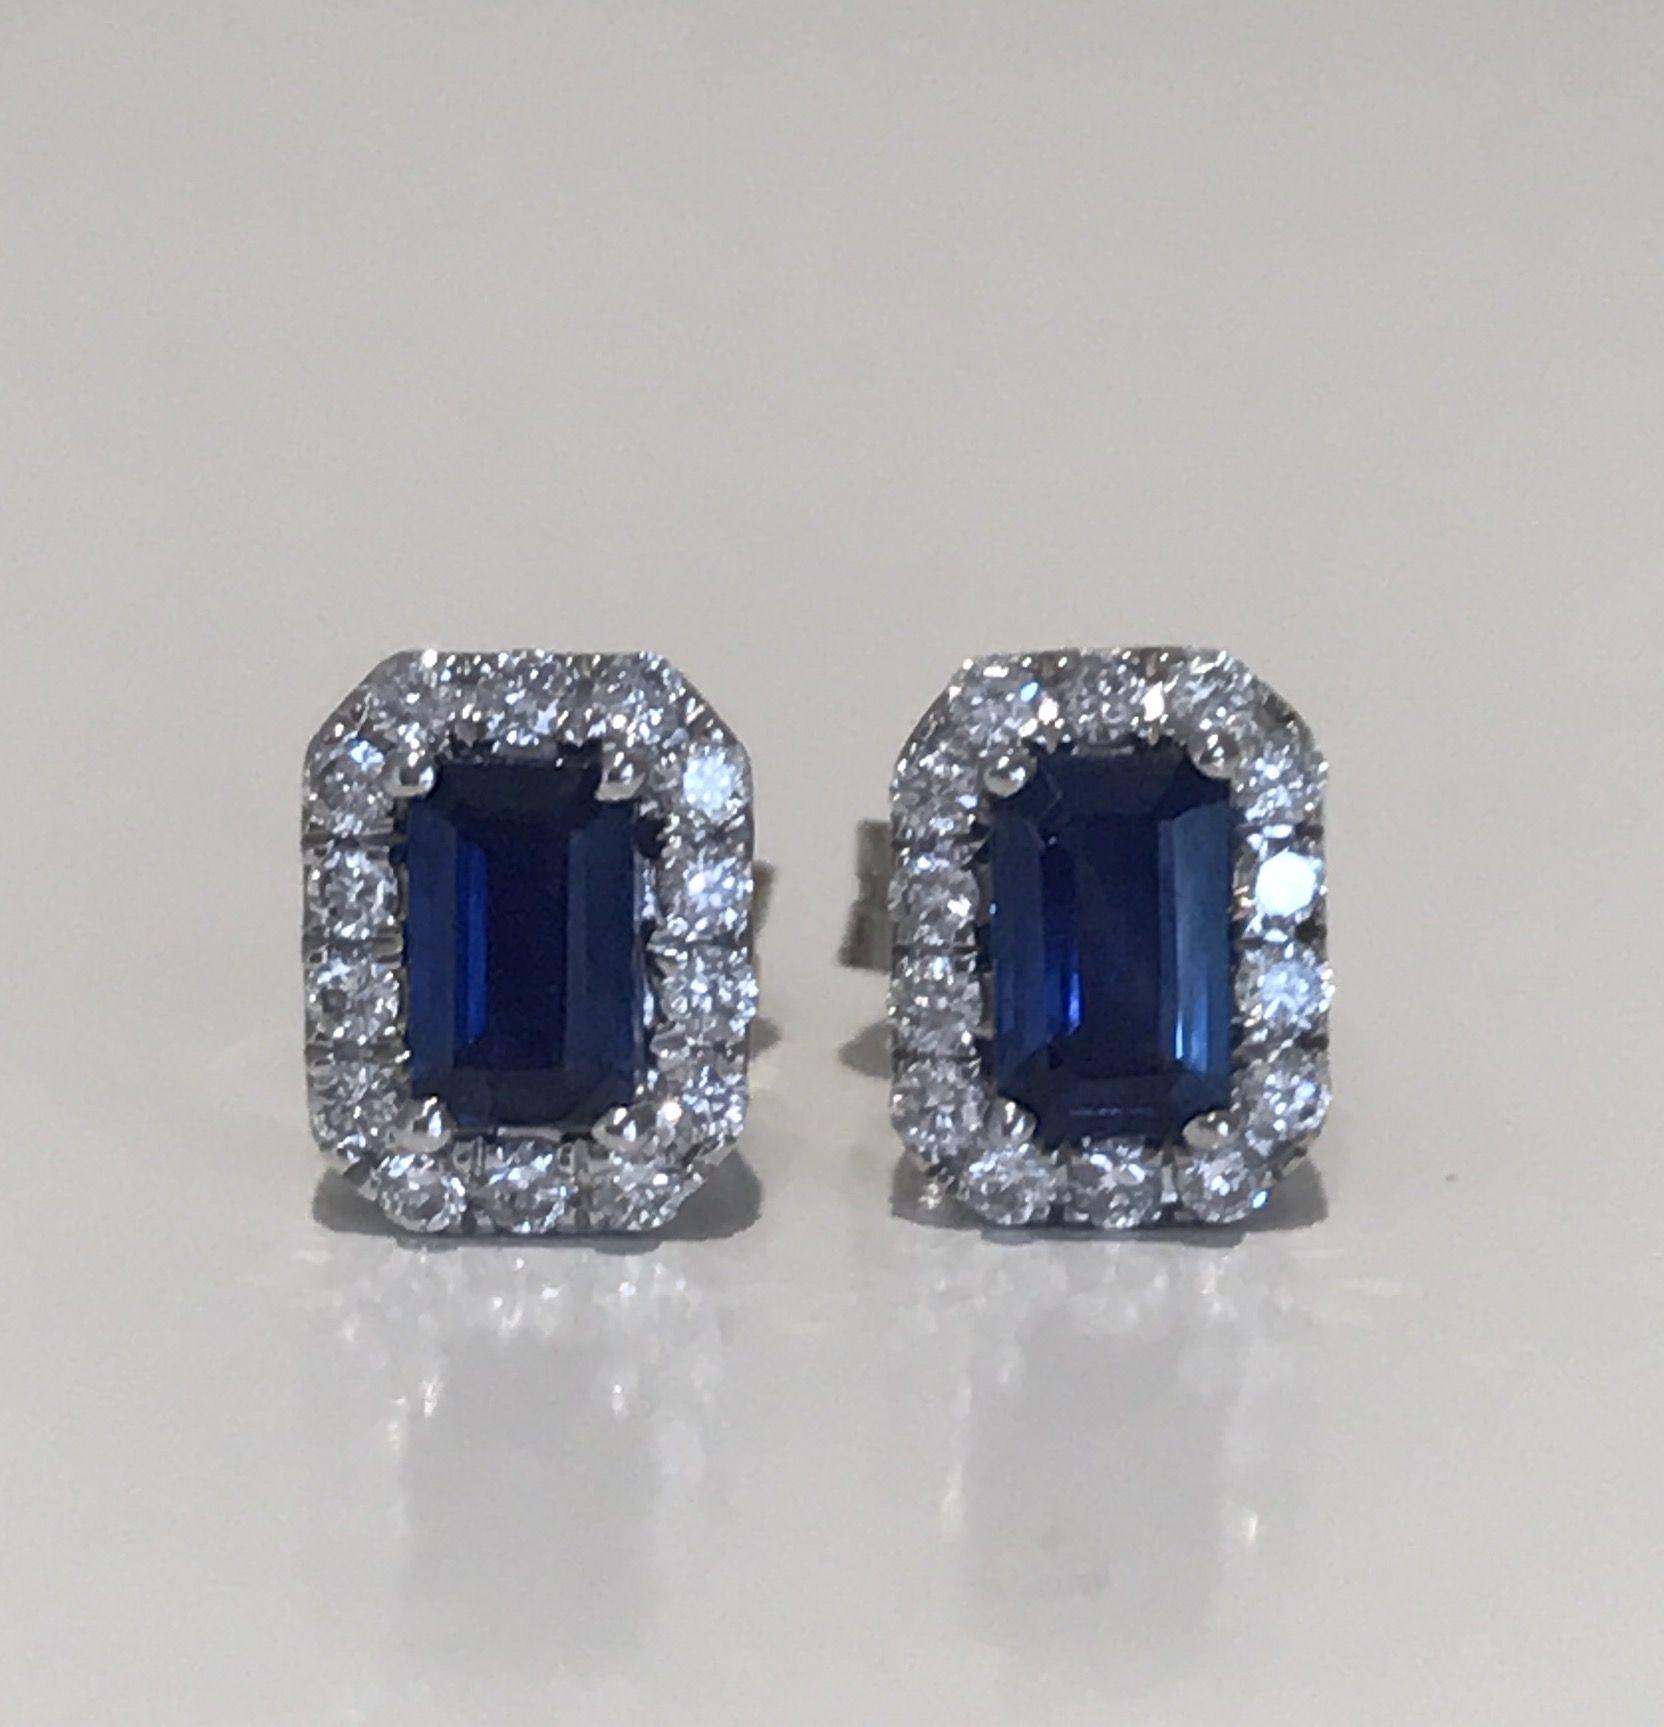 Sapphire & Diamond Earrings 18k £380 Sapphires